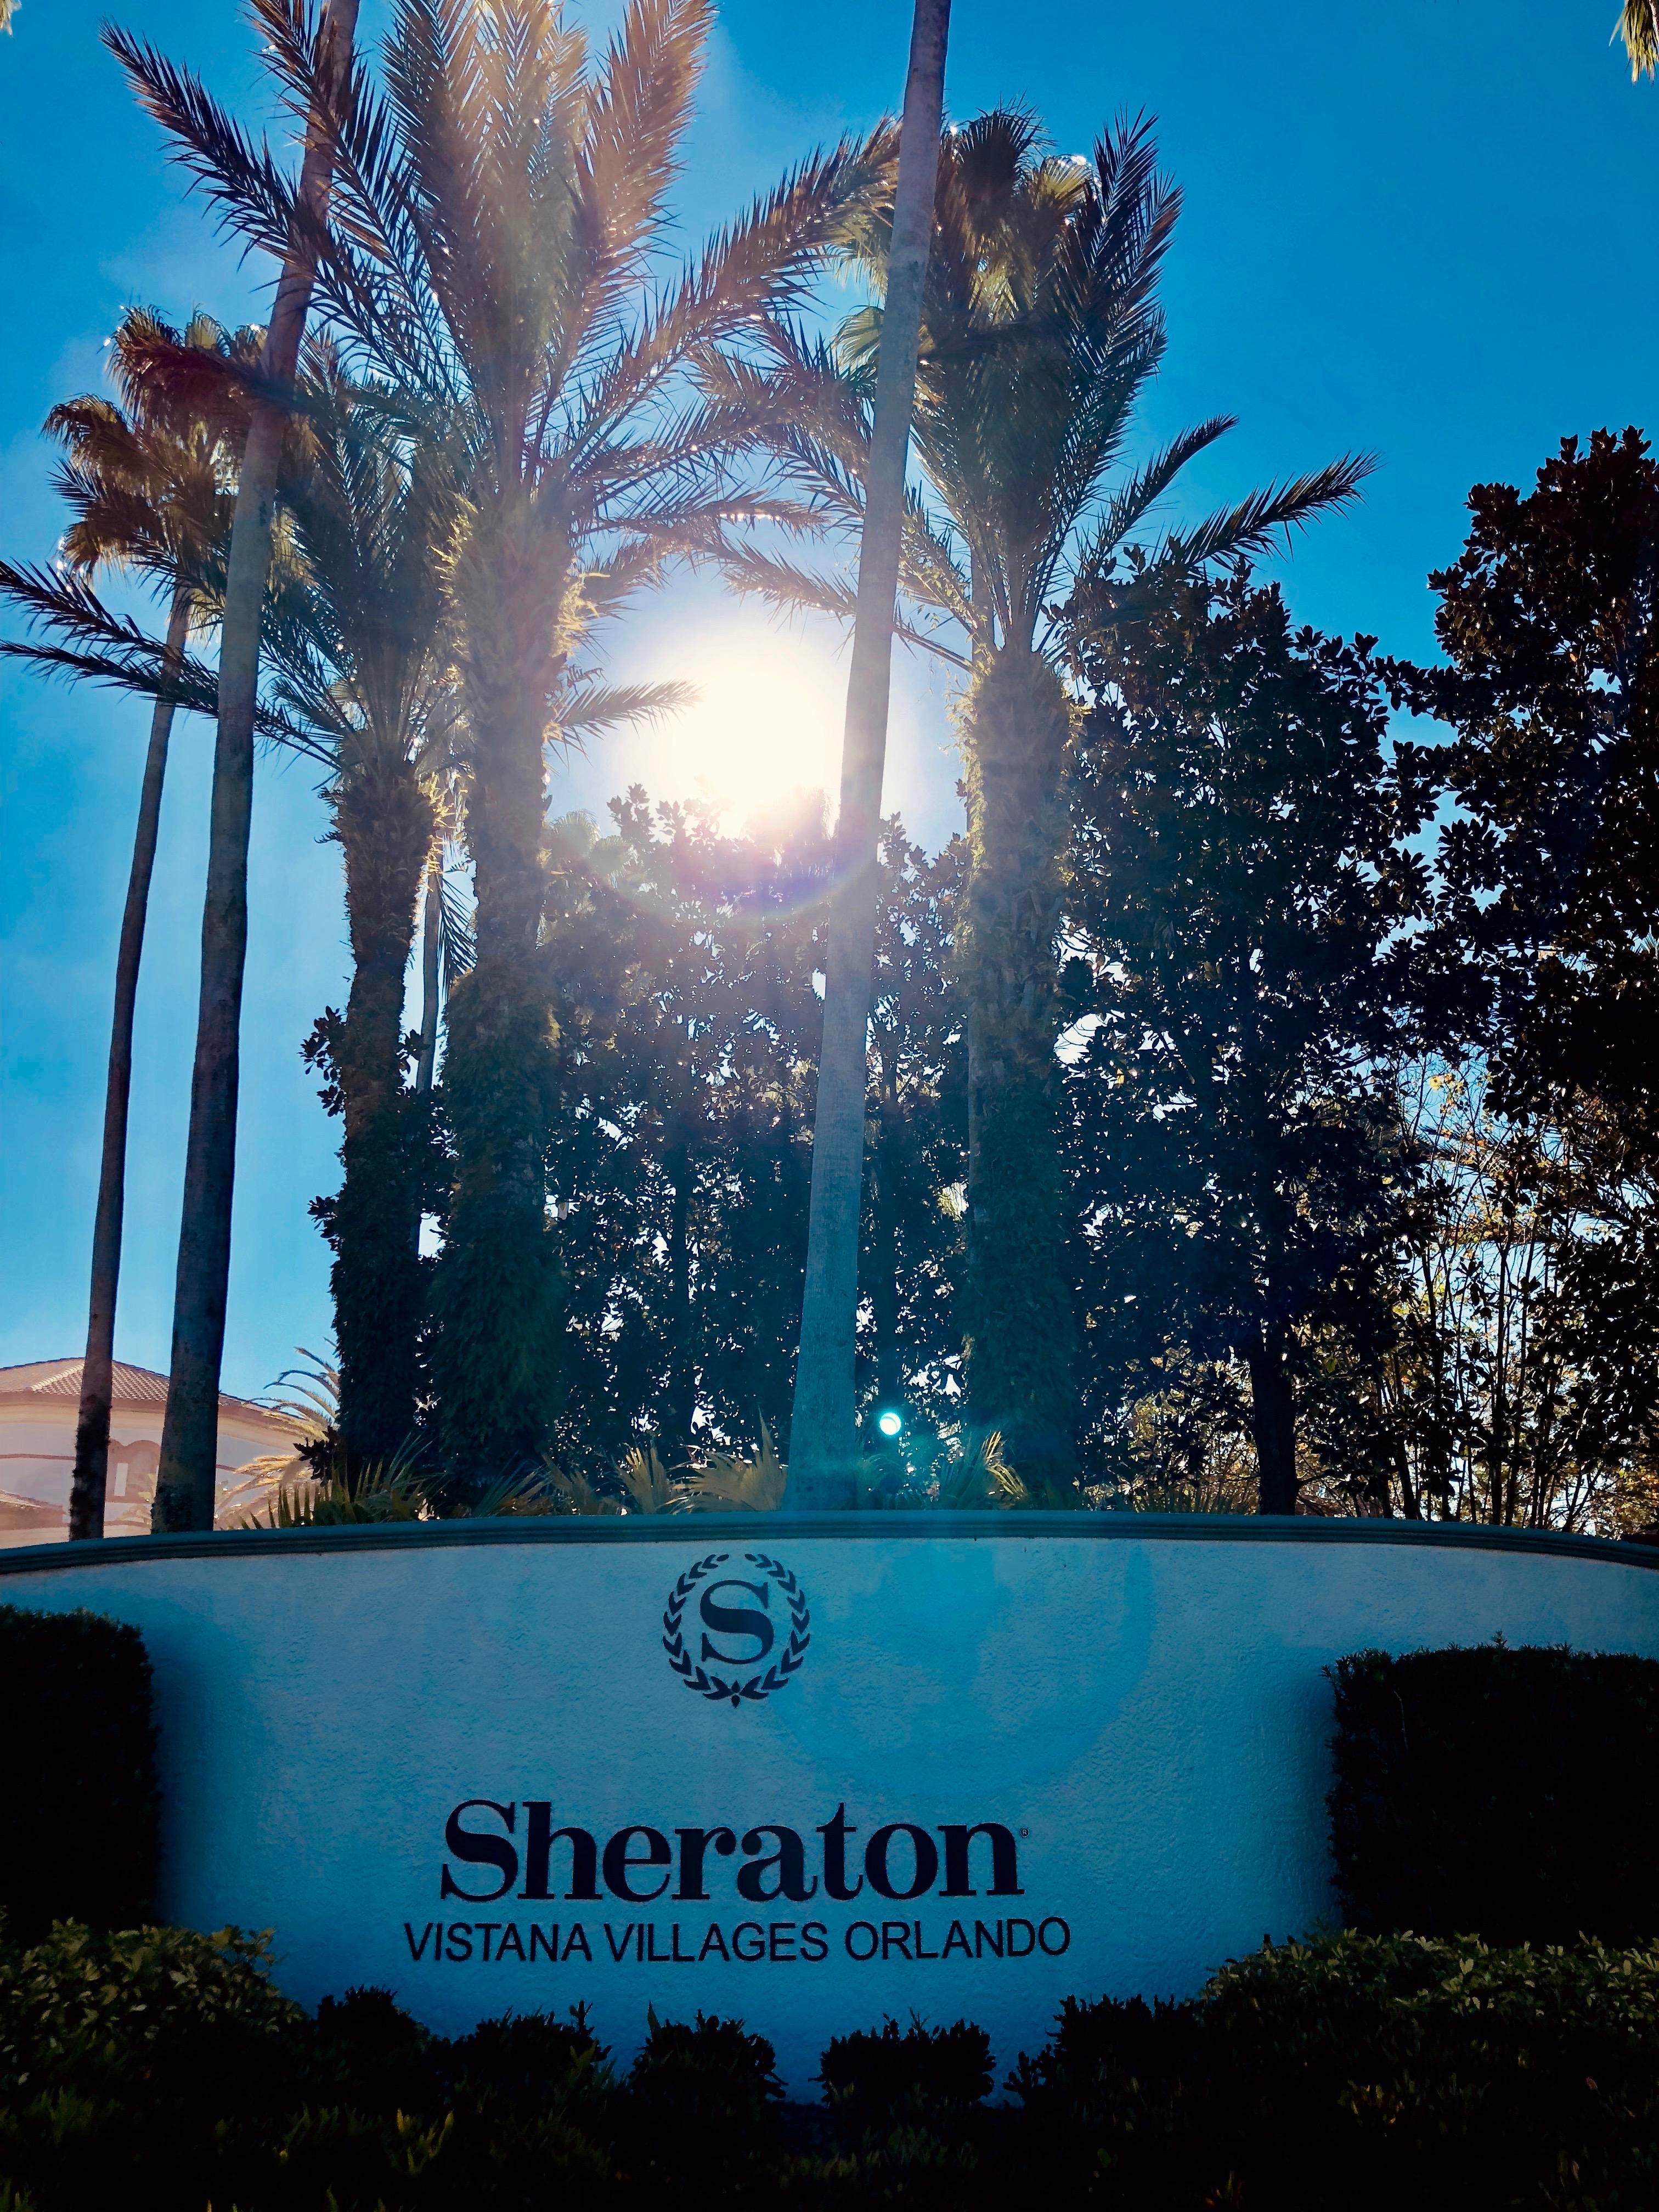 Sheraton Sign